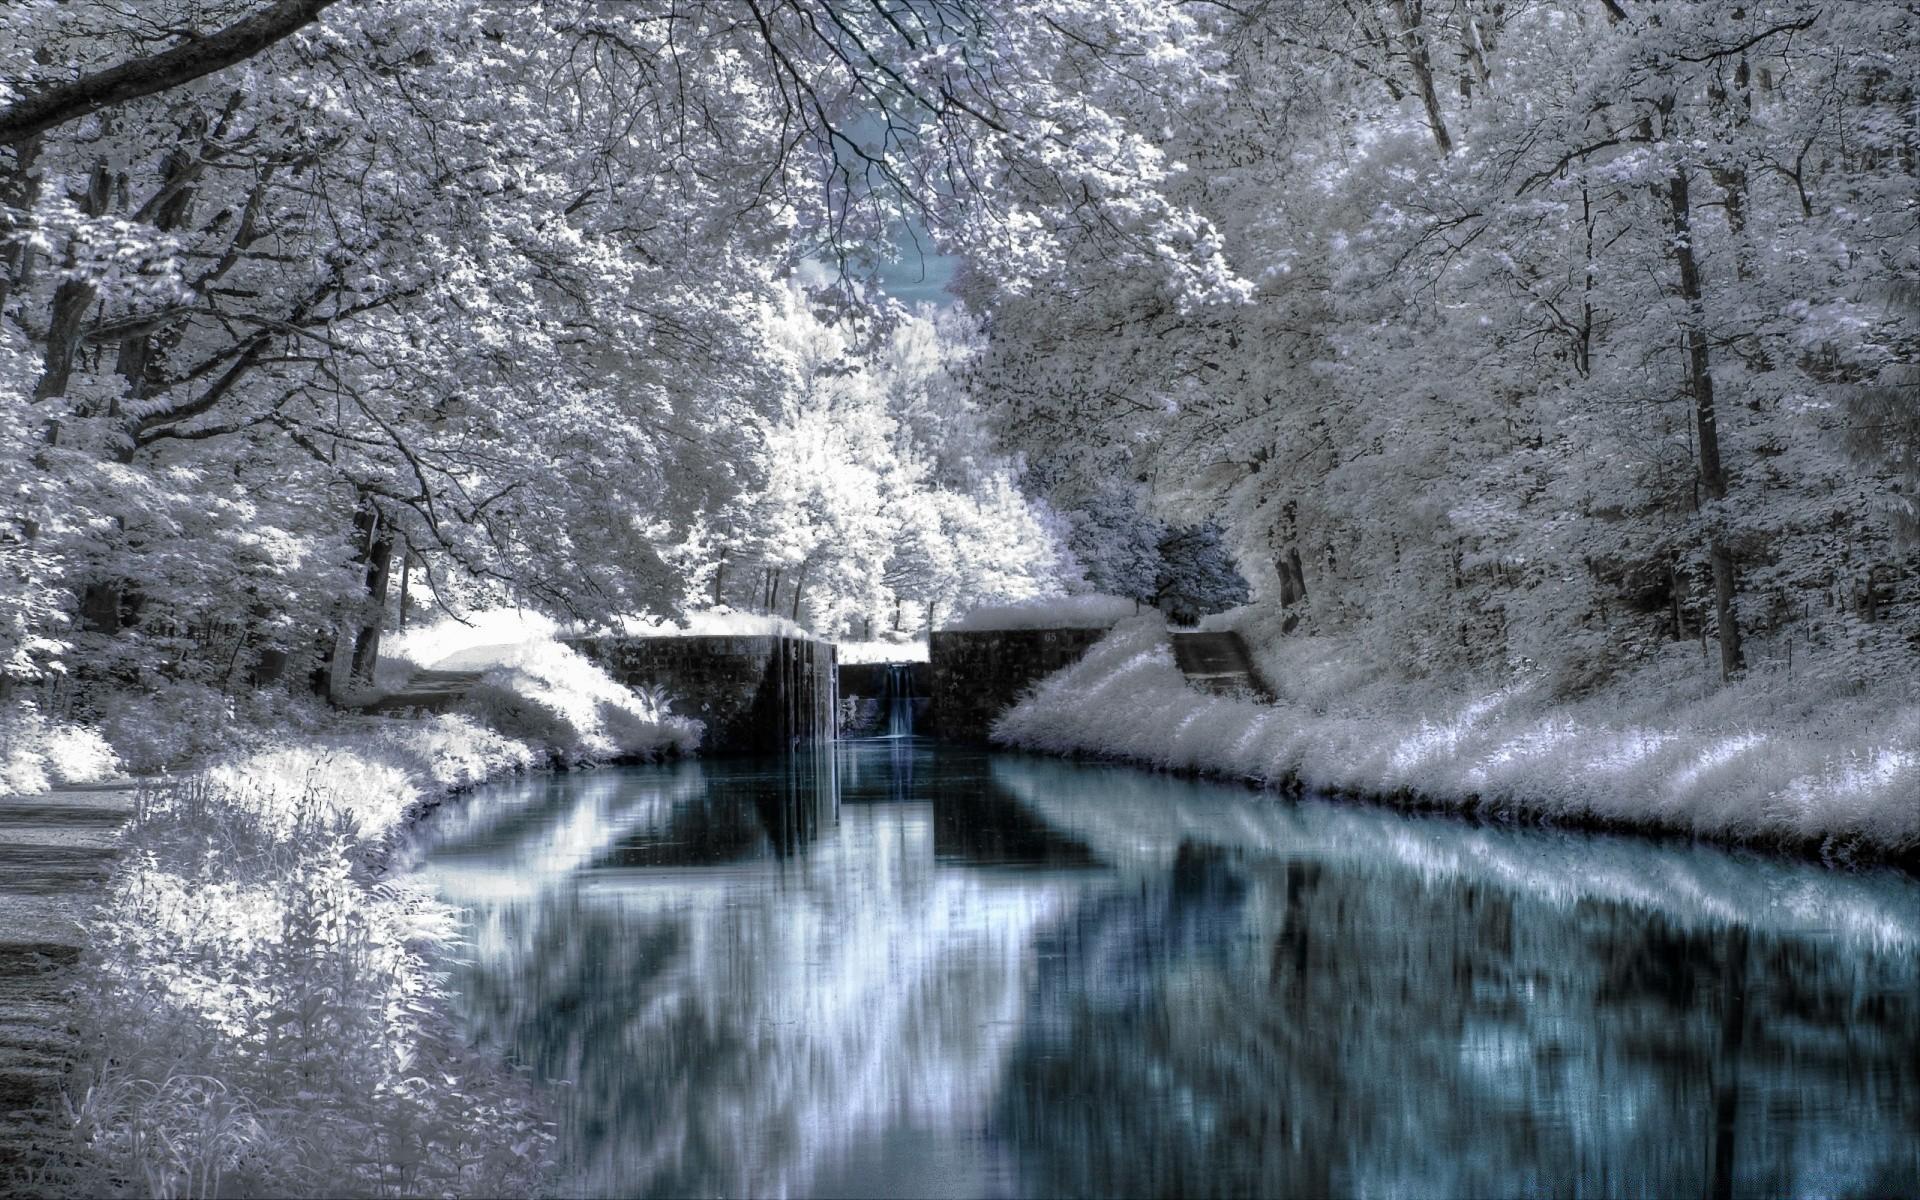 водопад снег лес waterfall snow forest бесплатно